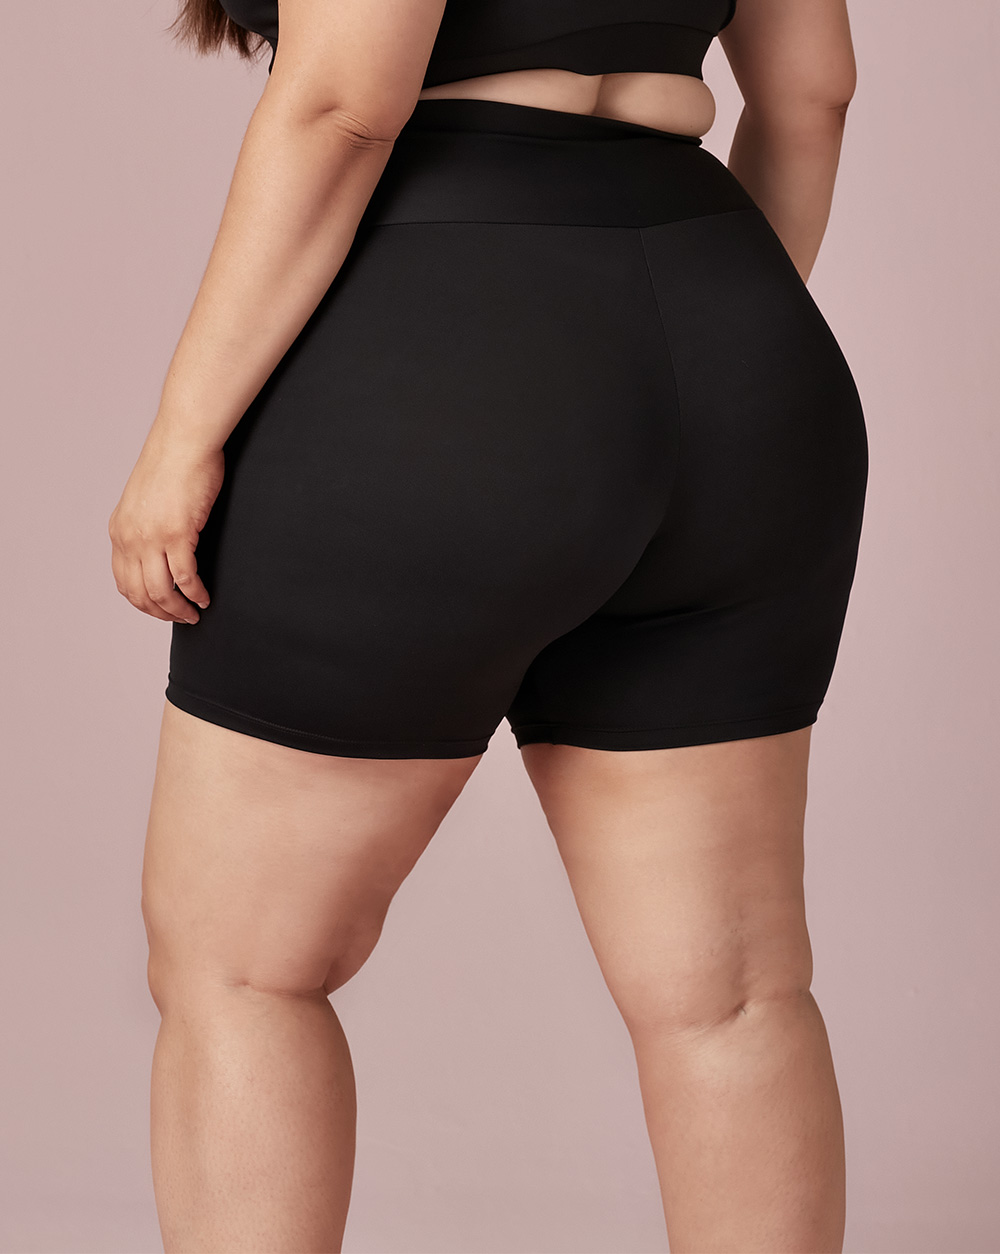 Shorts Cós Sem Costura - Dukley Lingerie - Plus - 605